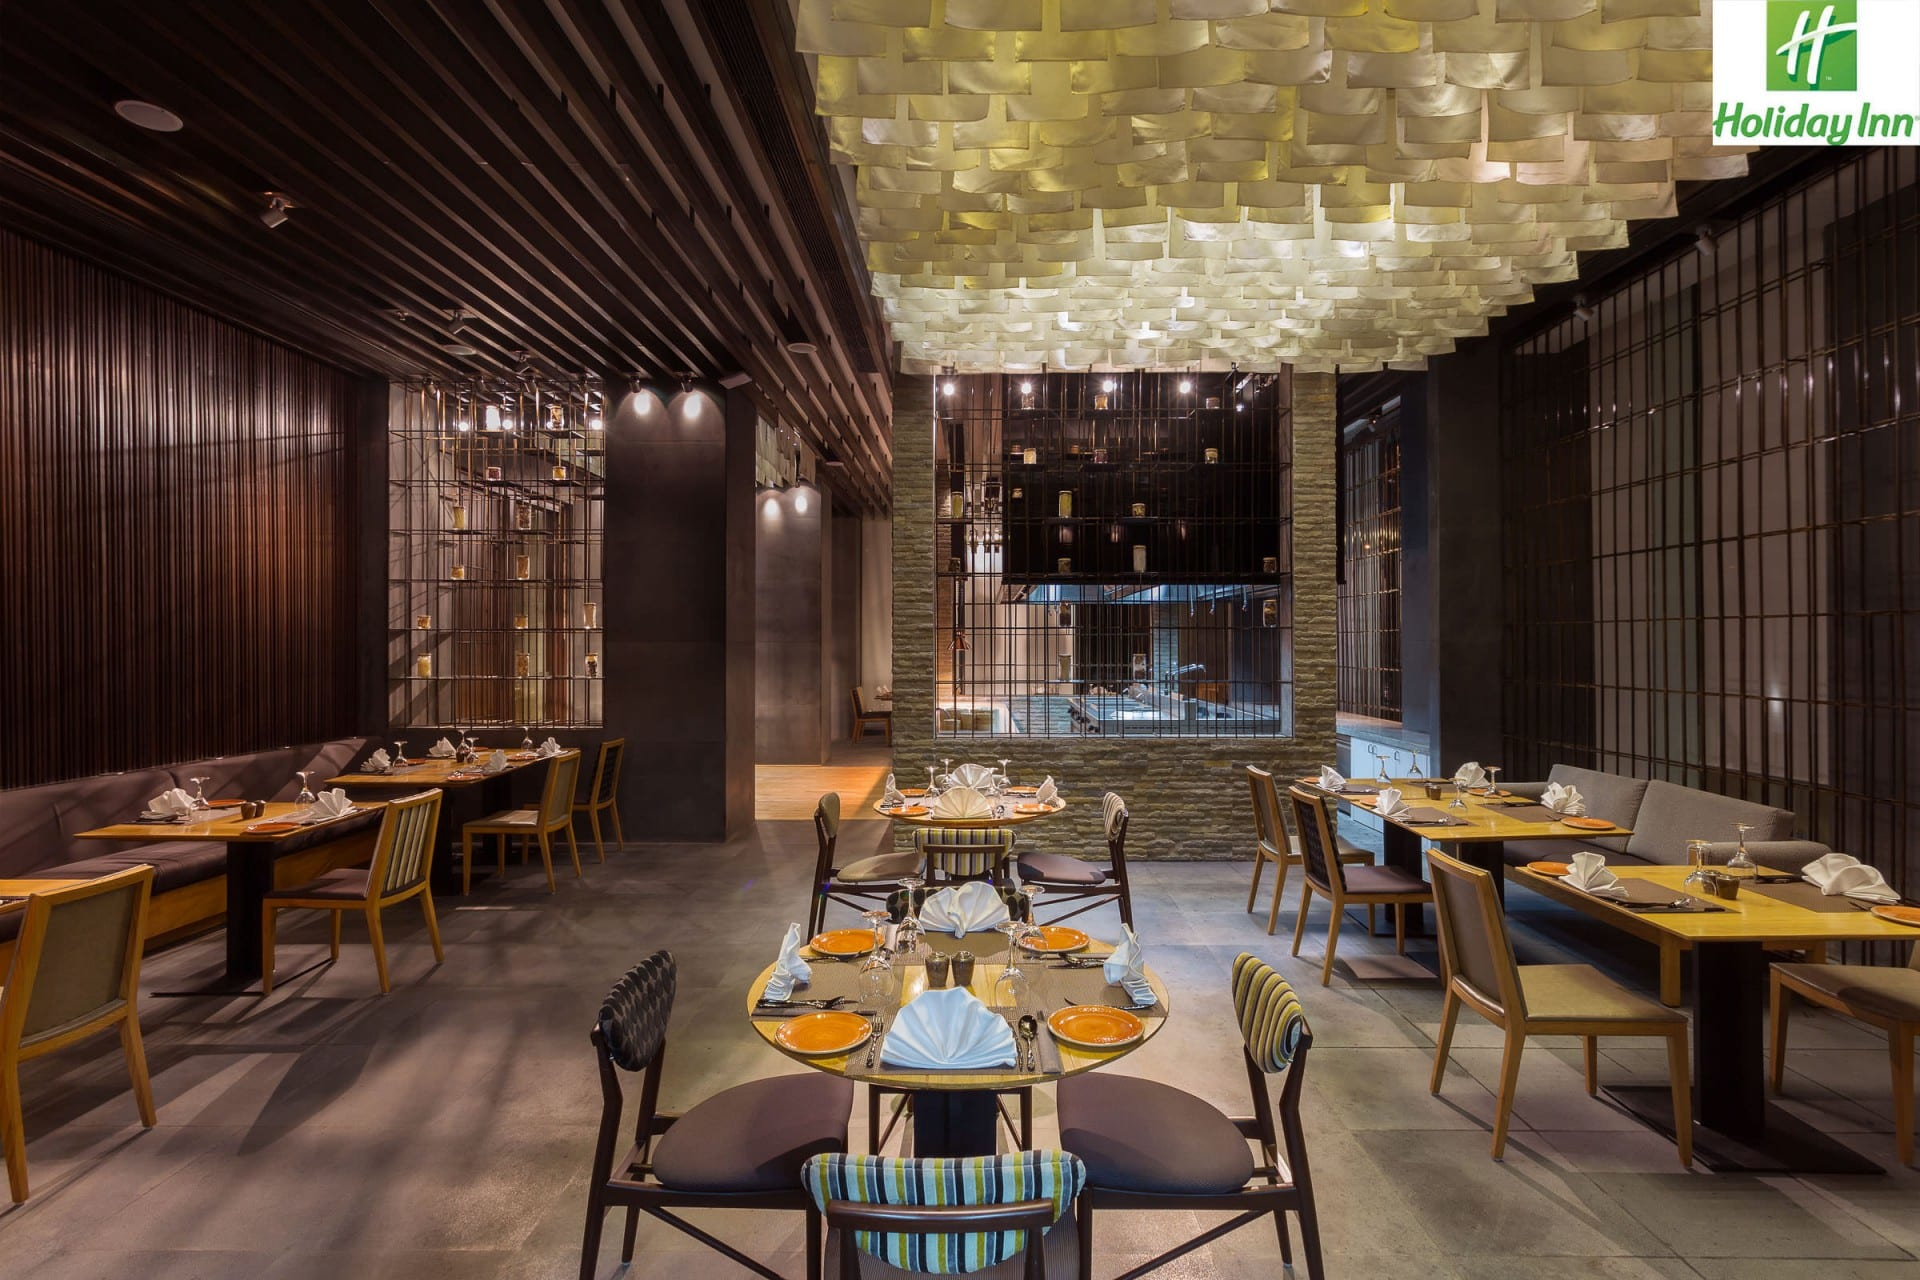 Best Architecture Photographer India   Holiday Inn Restaurant Photography Jaipur